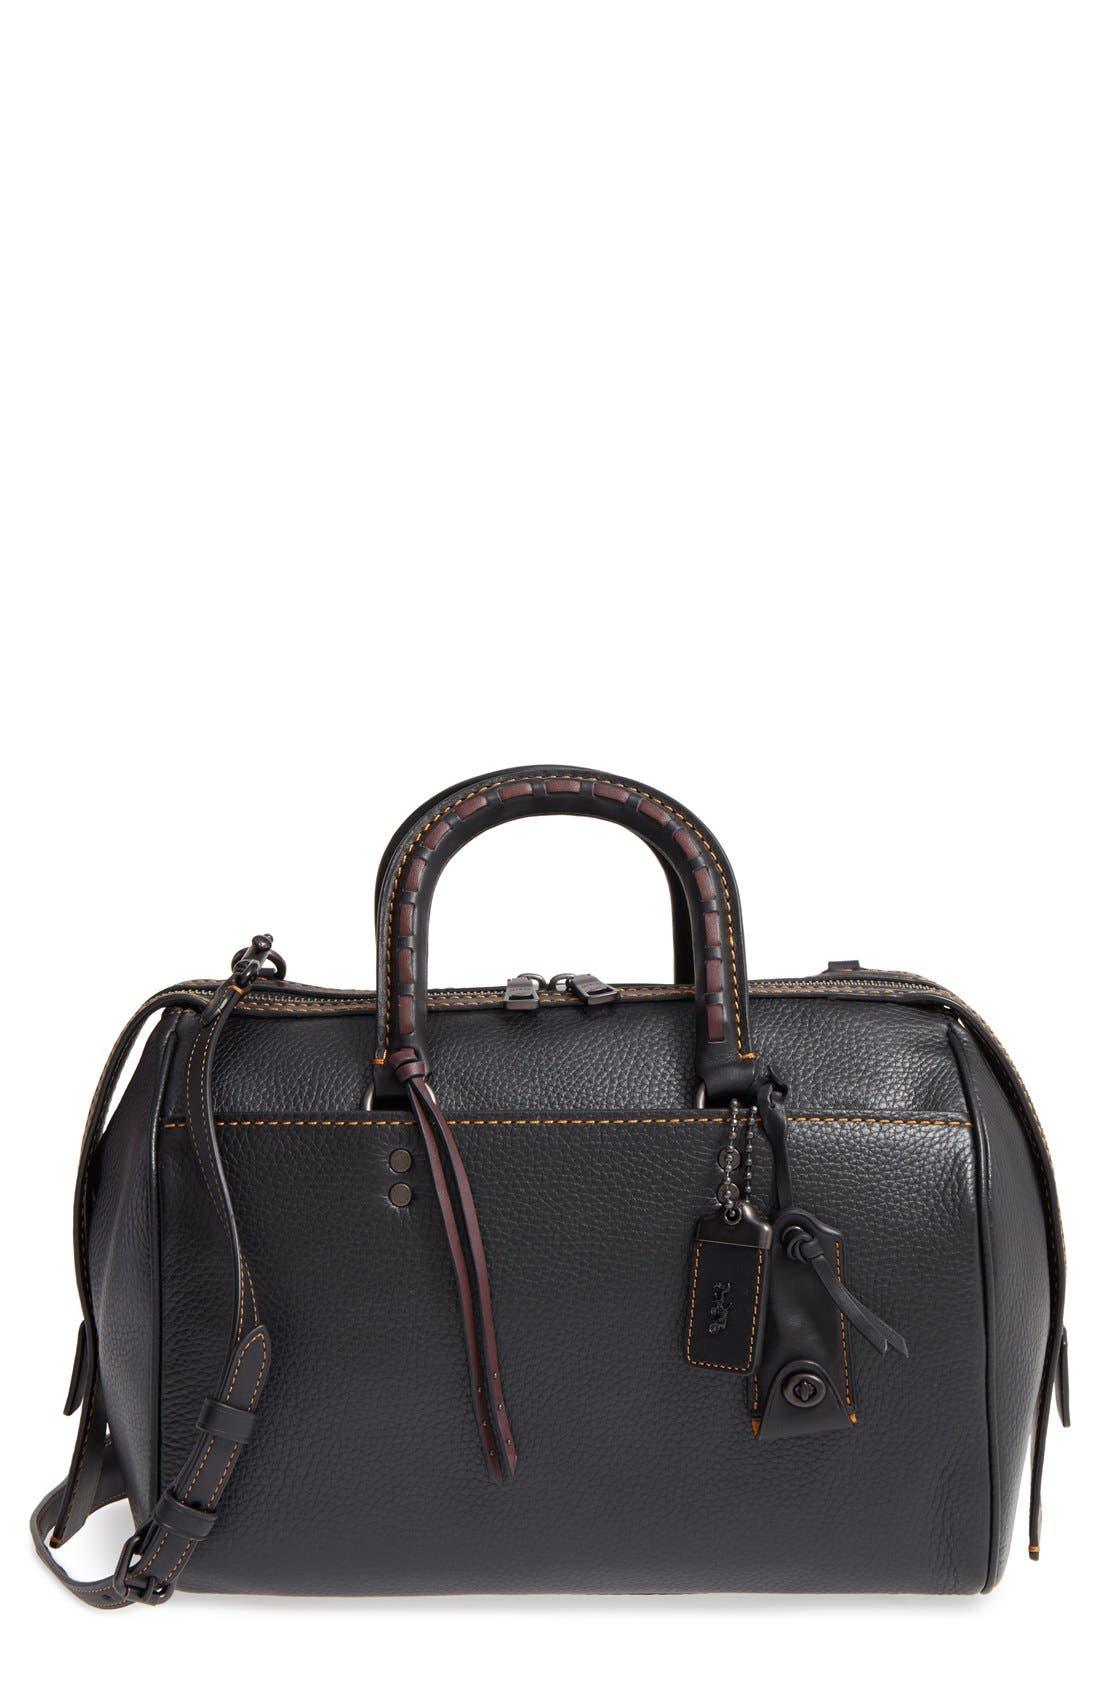 Rogue Leather Satchel,                         Main,                         color, 001